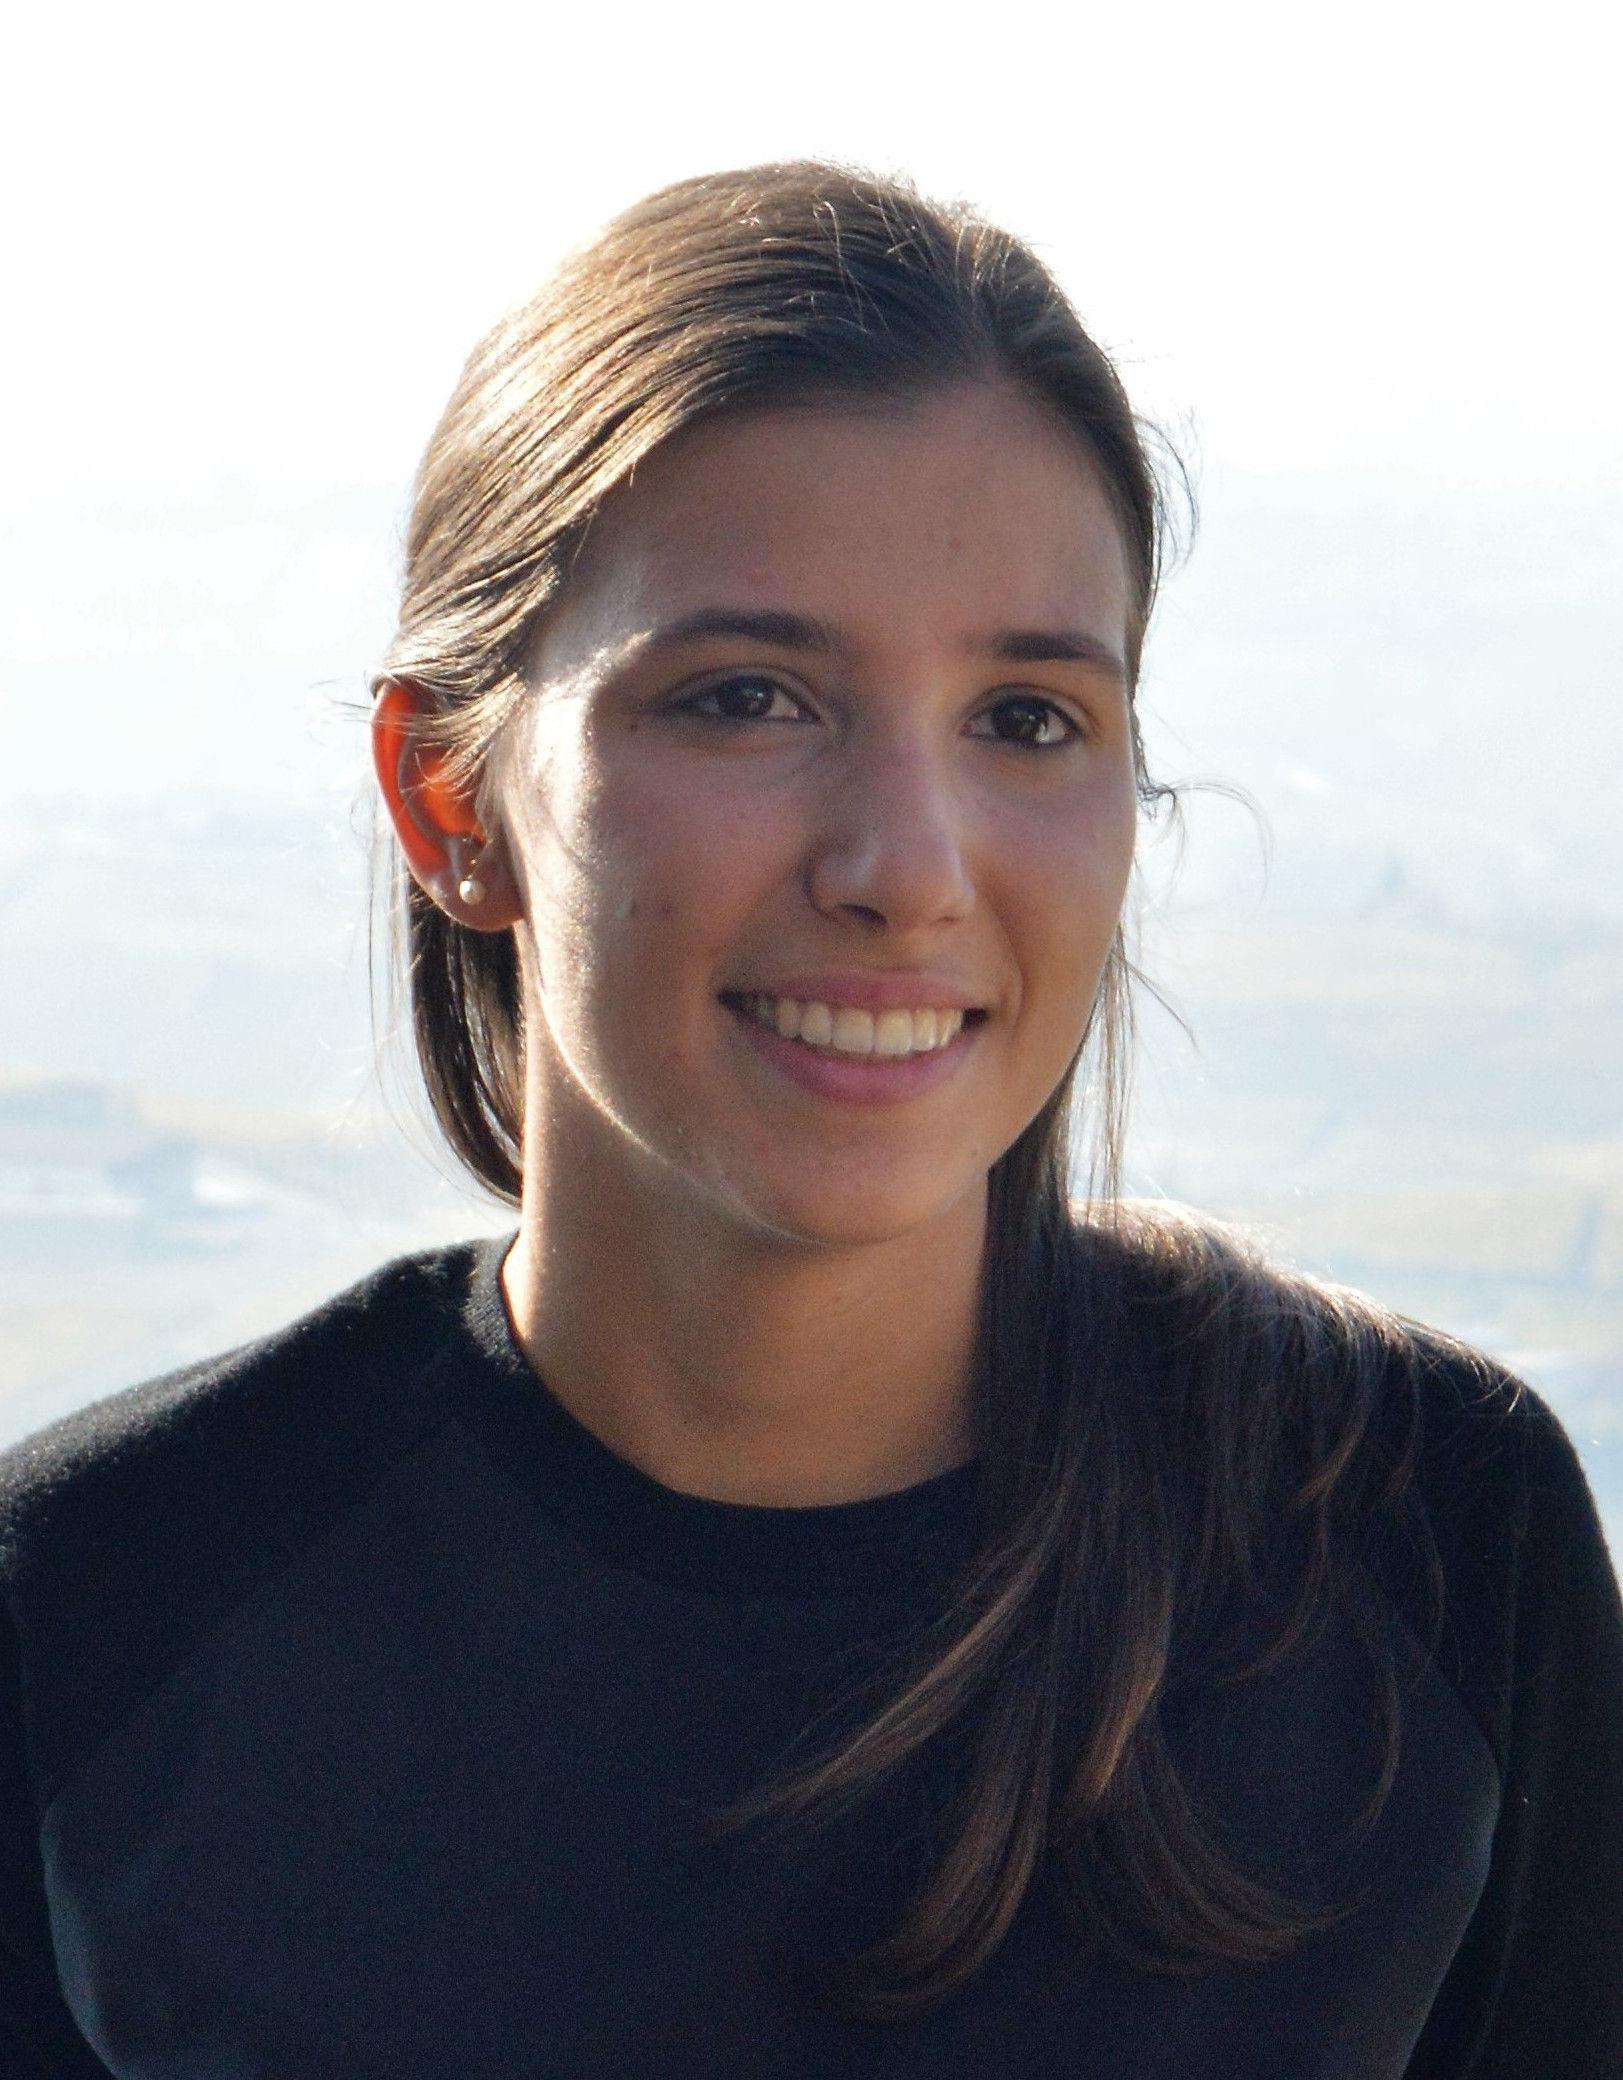 Enrica Soria